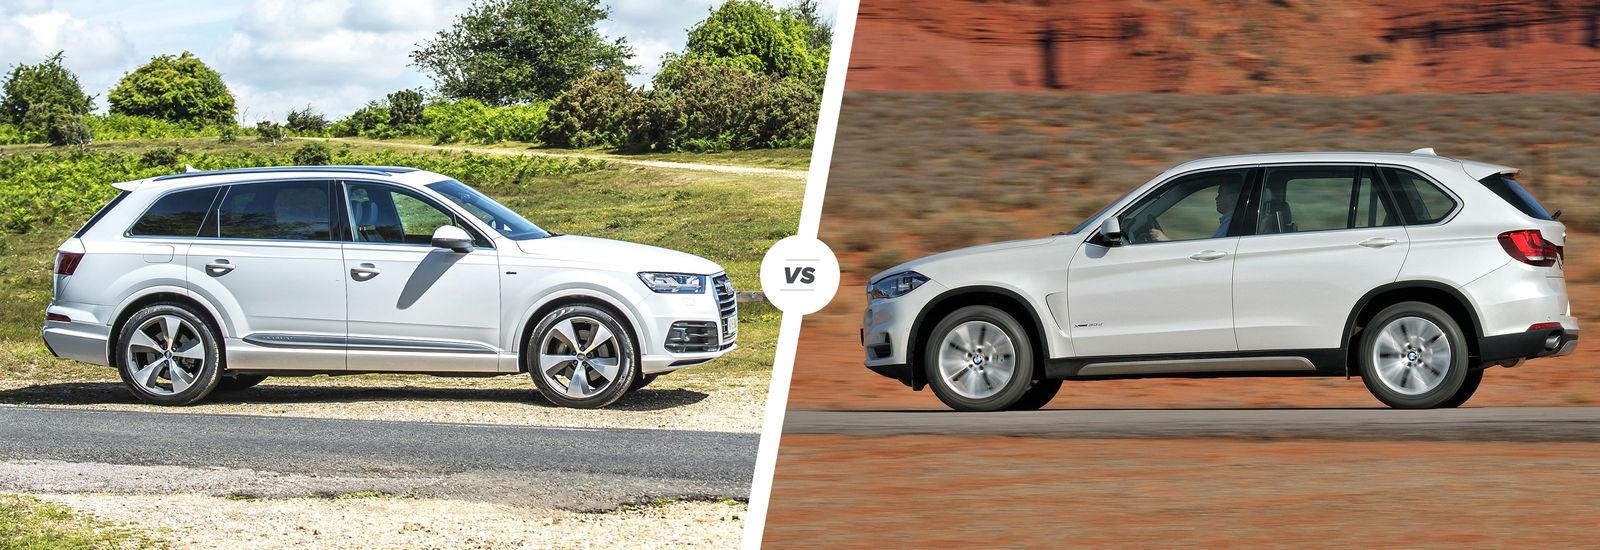 Audi Q7 Vs Bmw X5 Luxury Suv Showdown Carwow